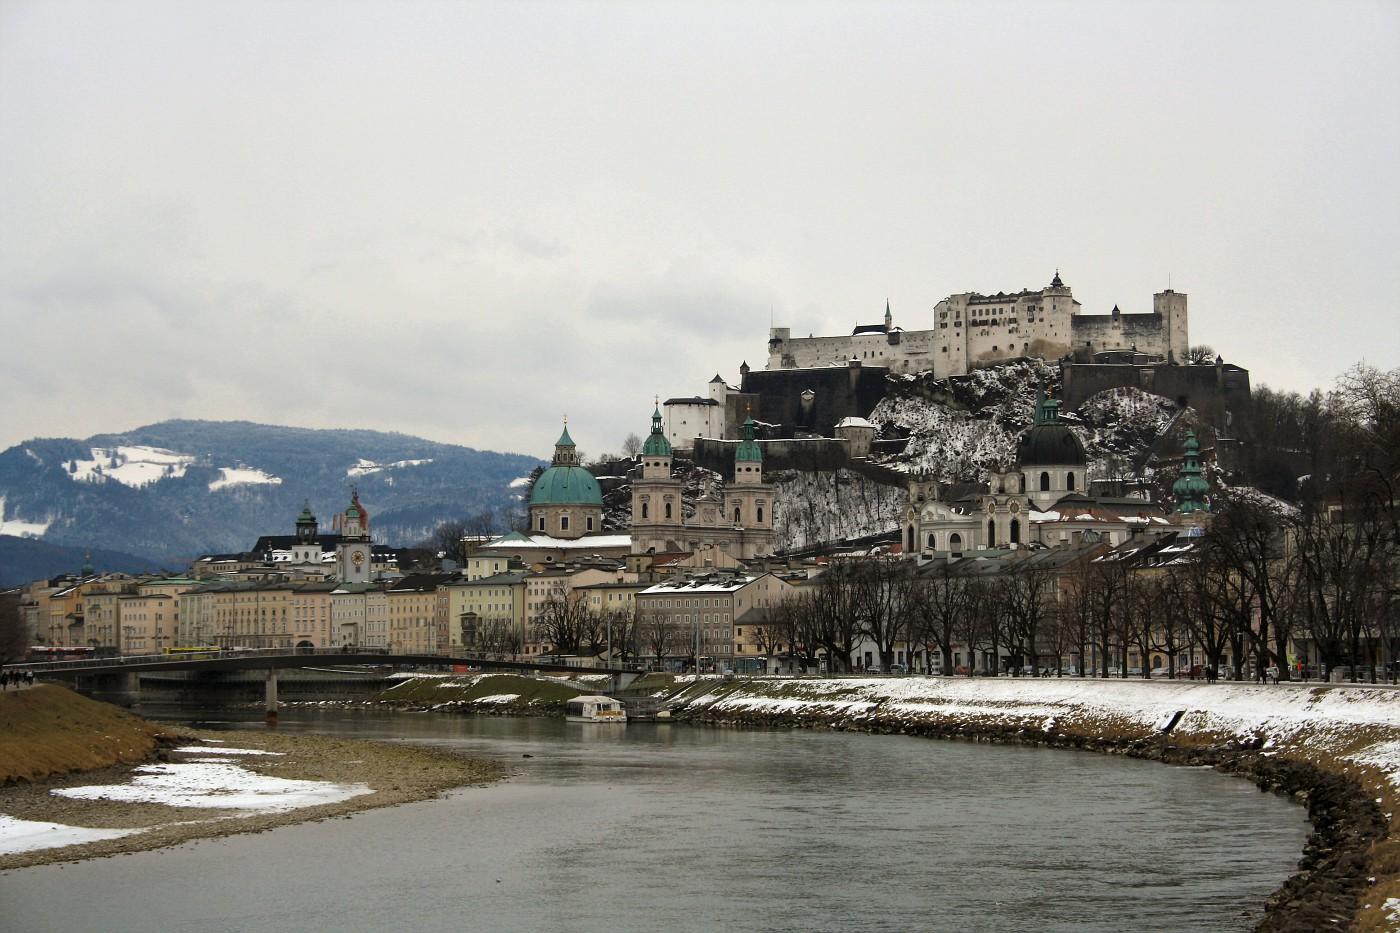 http://images19.fotki.com/v276/photos/2/243162/8488810/Salzburg2-vi.jpg